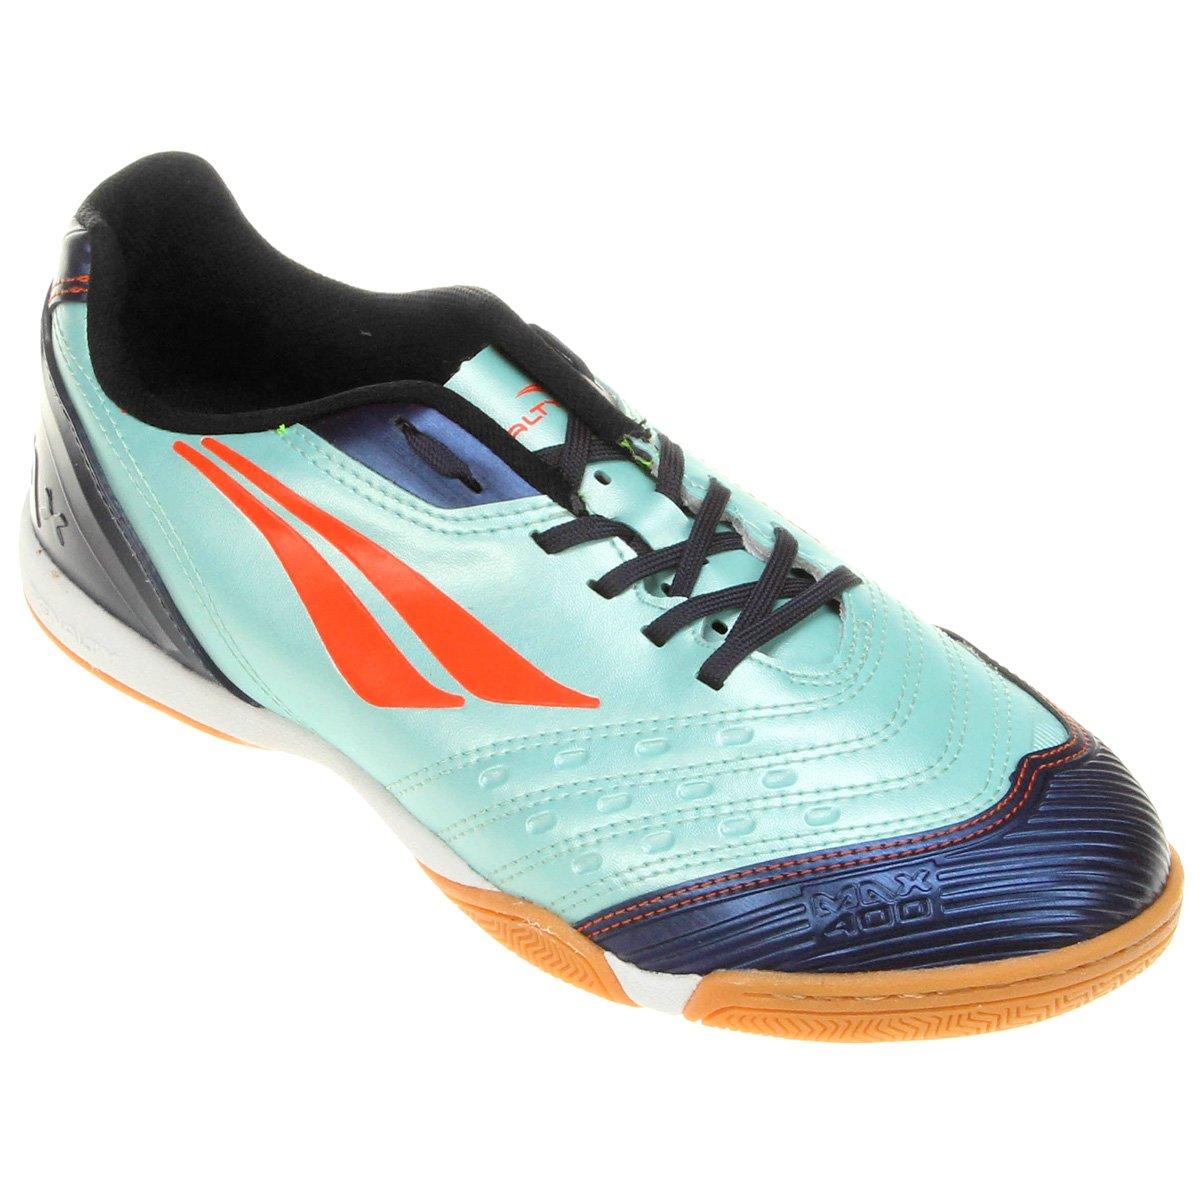 Chuteira Penalty Max 400 S Futsal - Compre Agora  a4b767807efbd